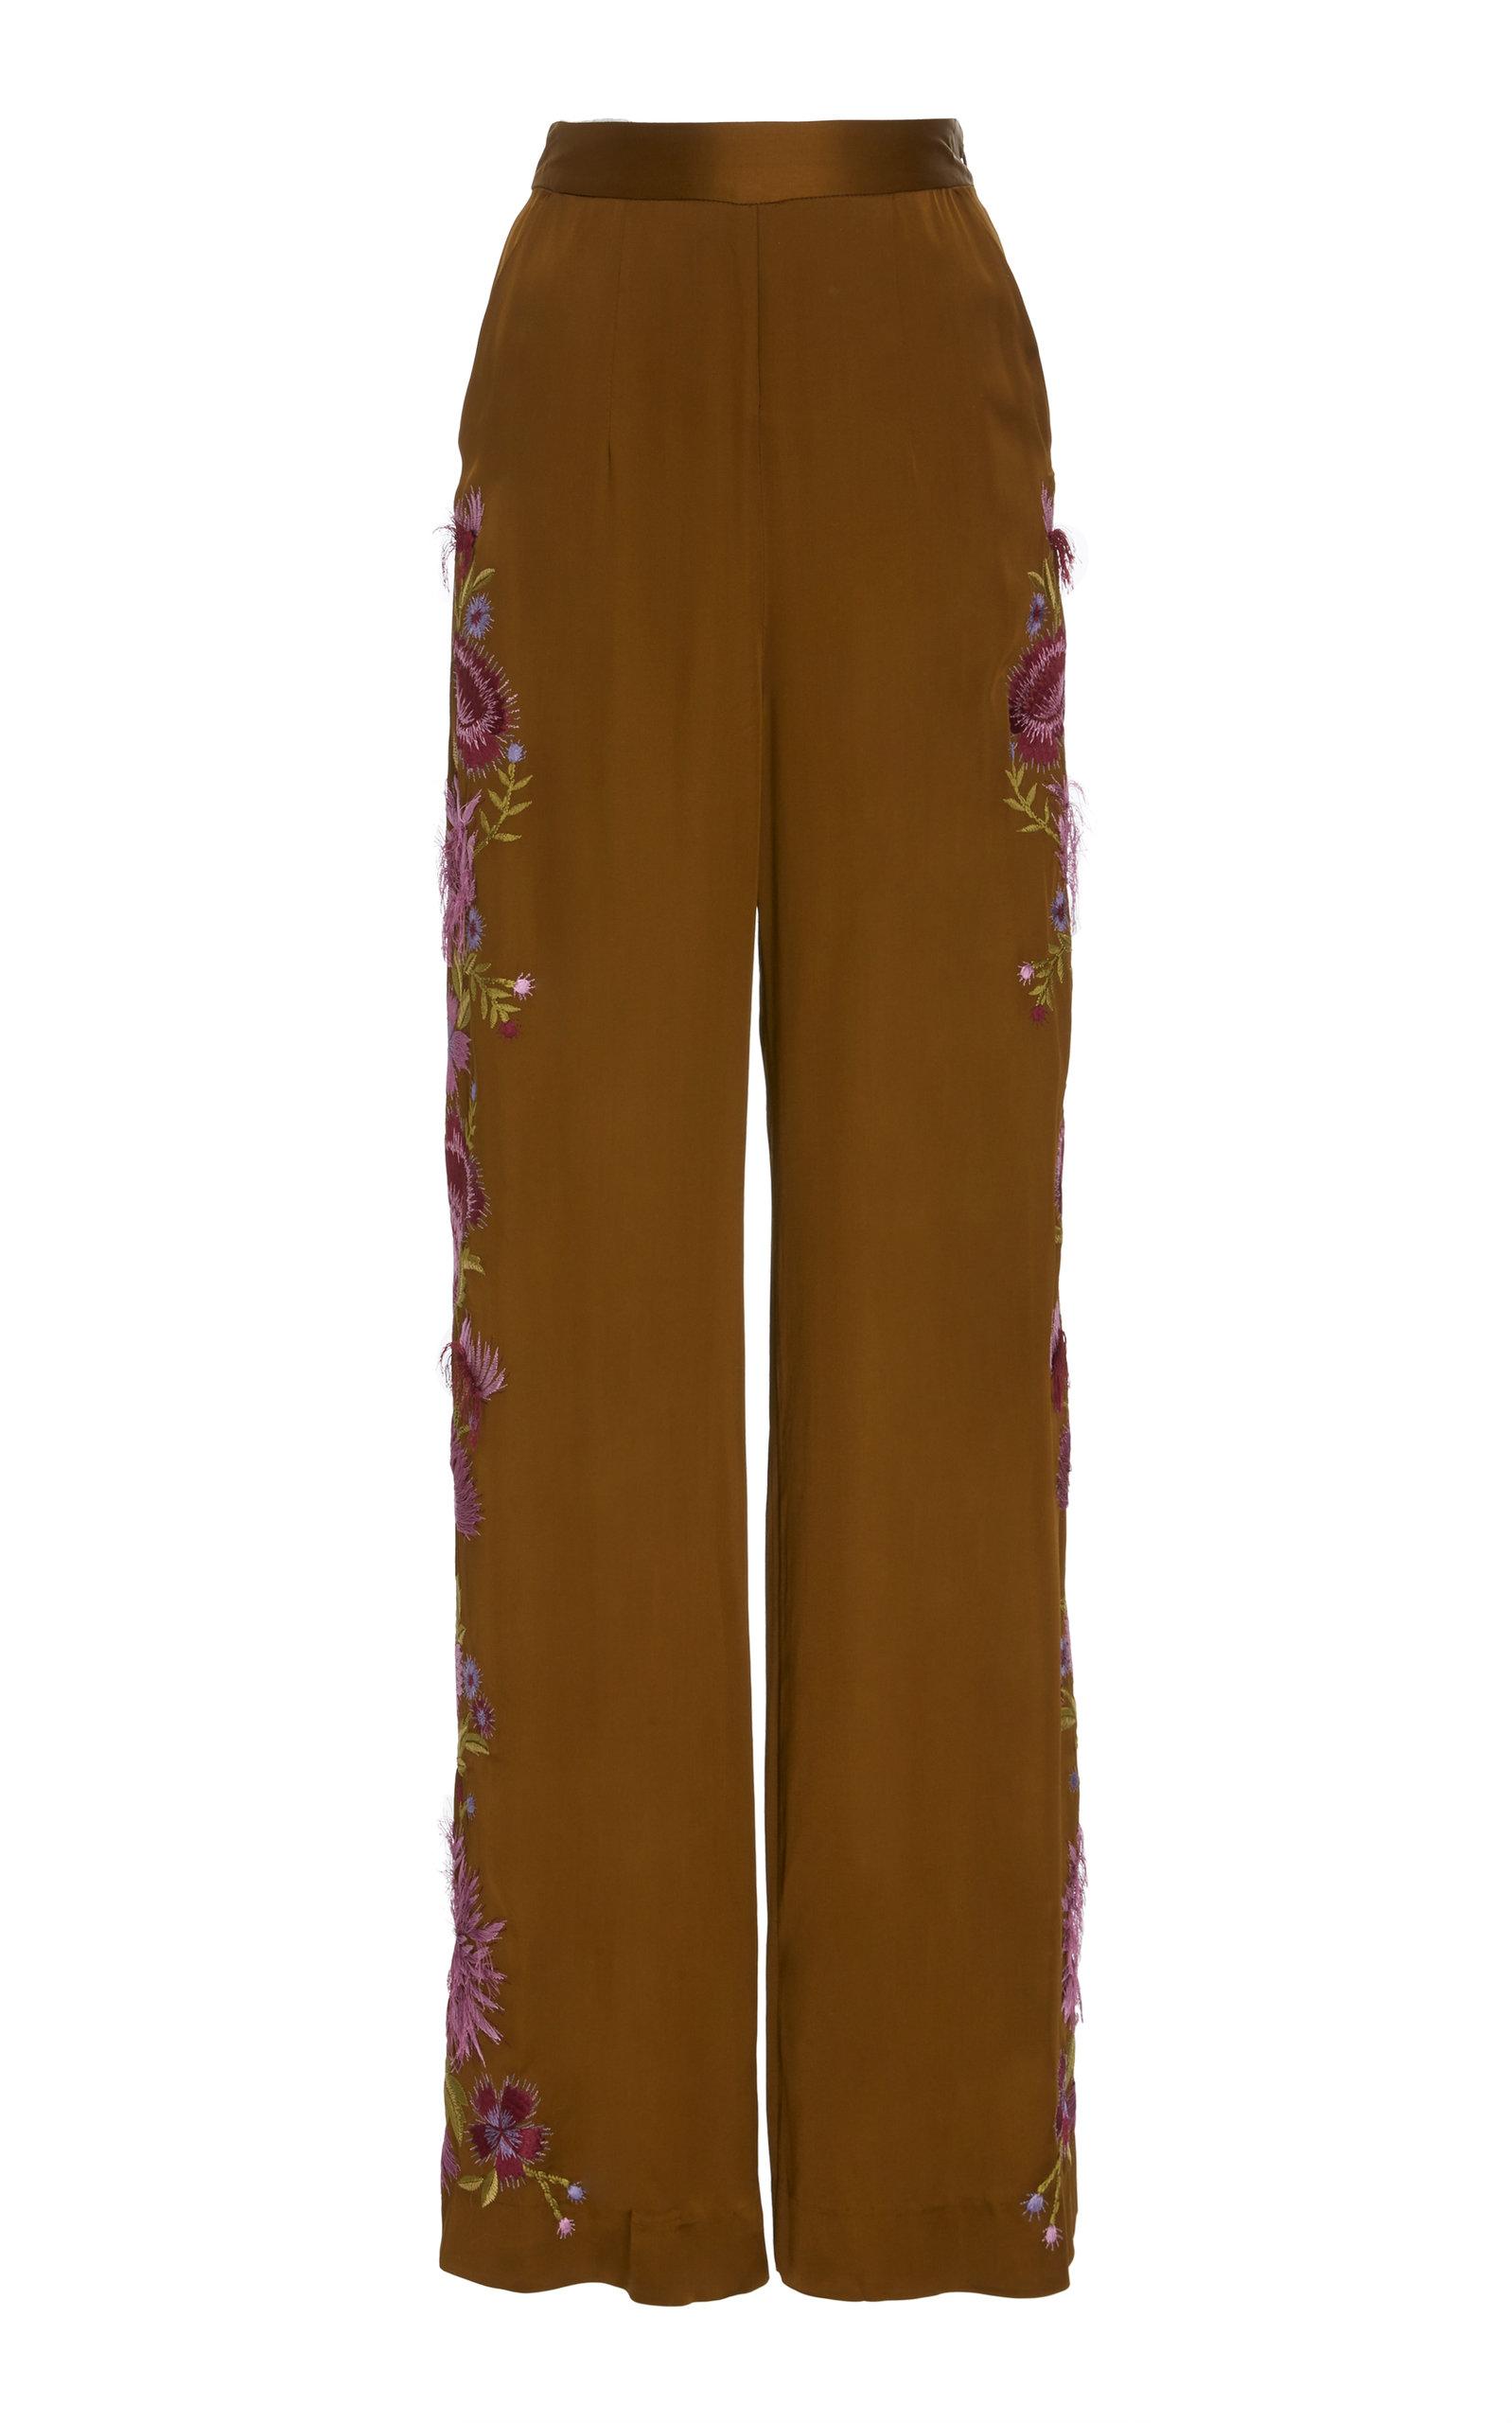 JOSIE NATORI COUTURE Wide Leg Pants in Brown